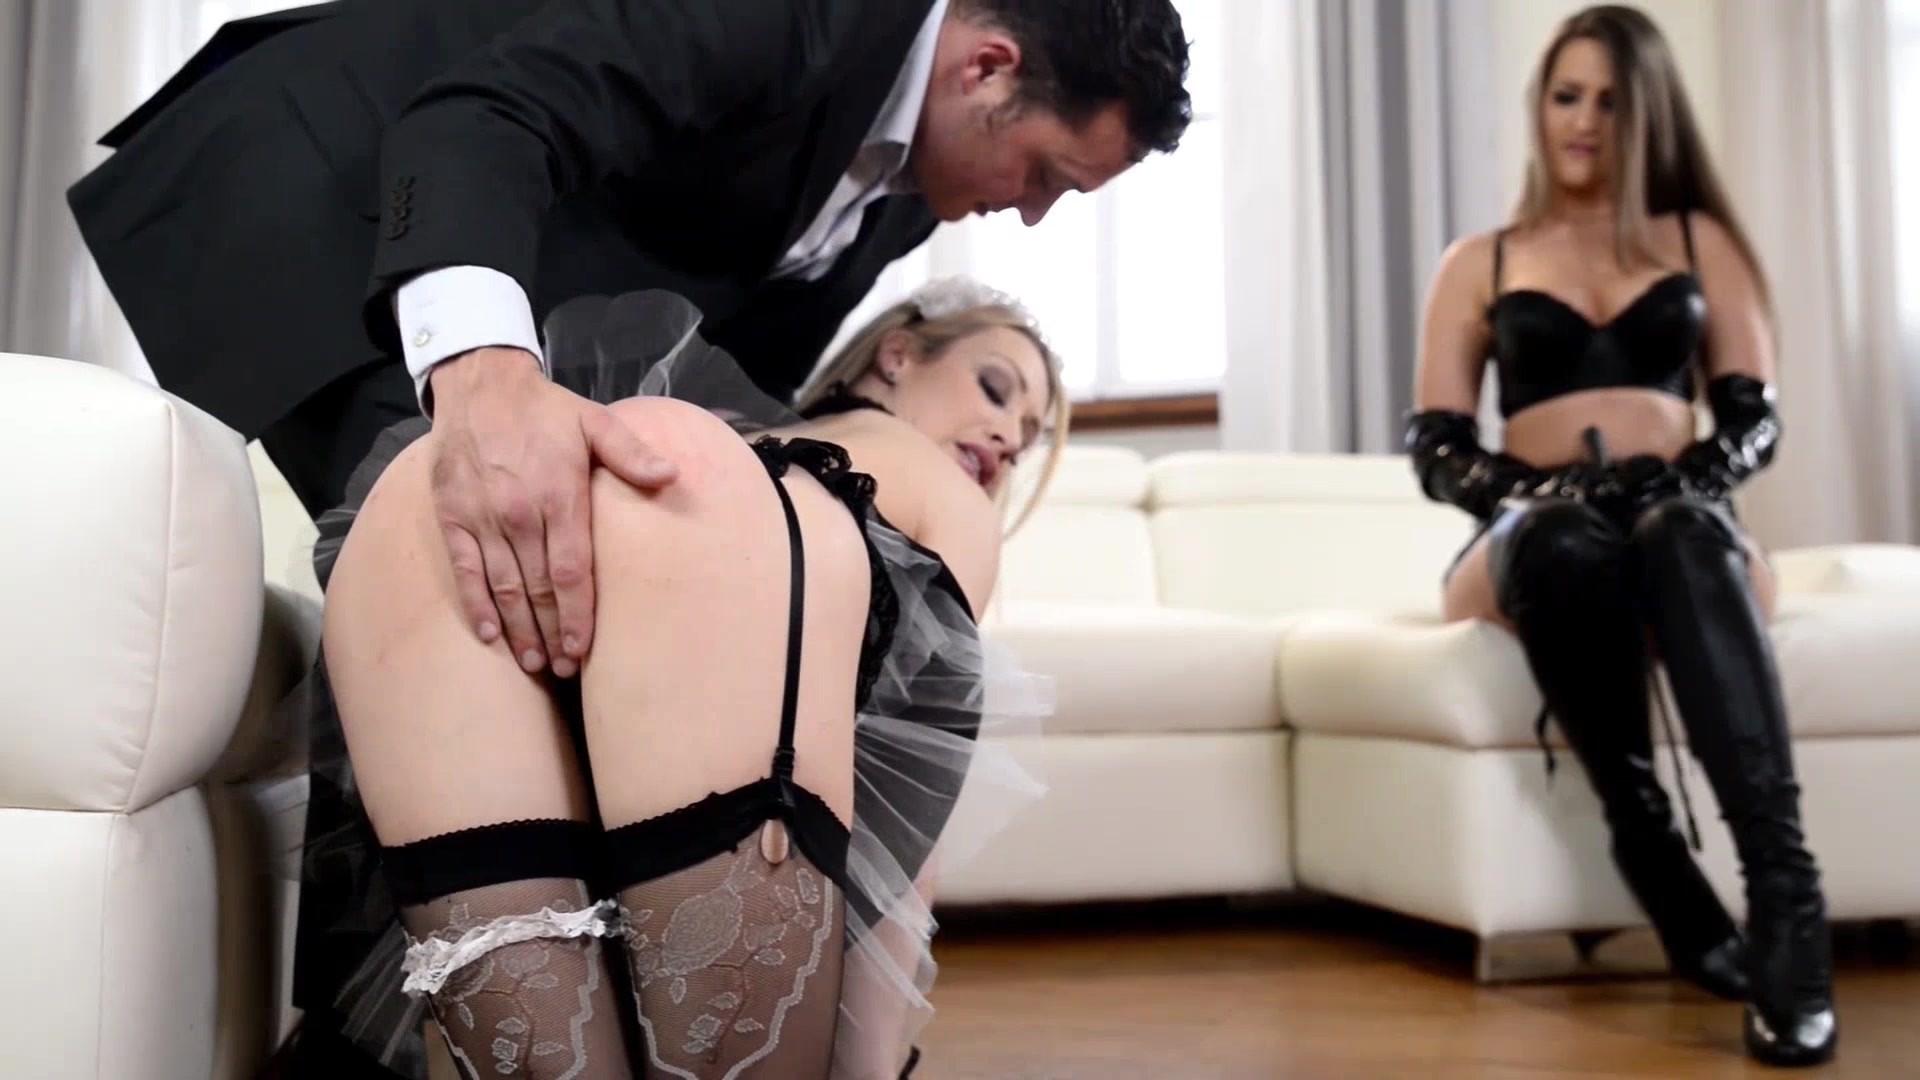 Хозяйка наказала горничную порно, Хозяйка наказала служанку - видео ctr Pages HD 20 фотография